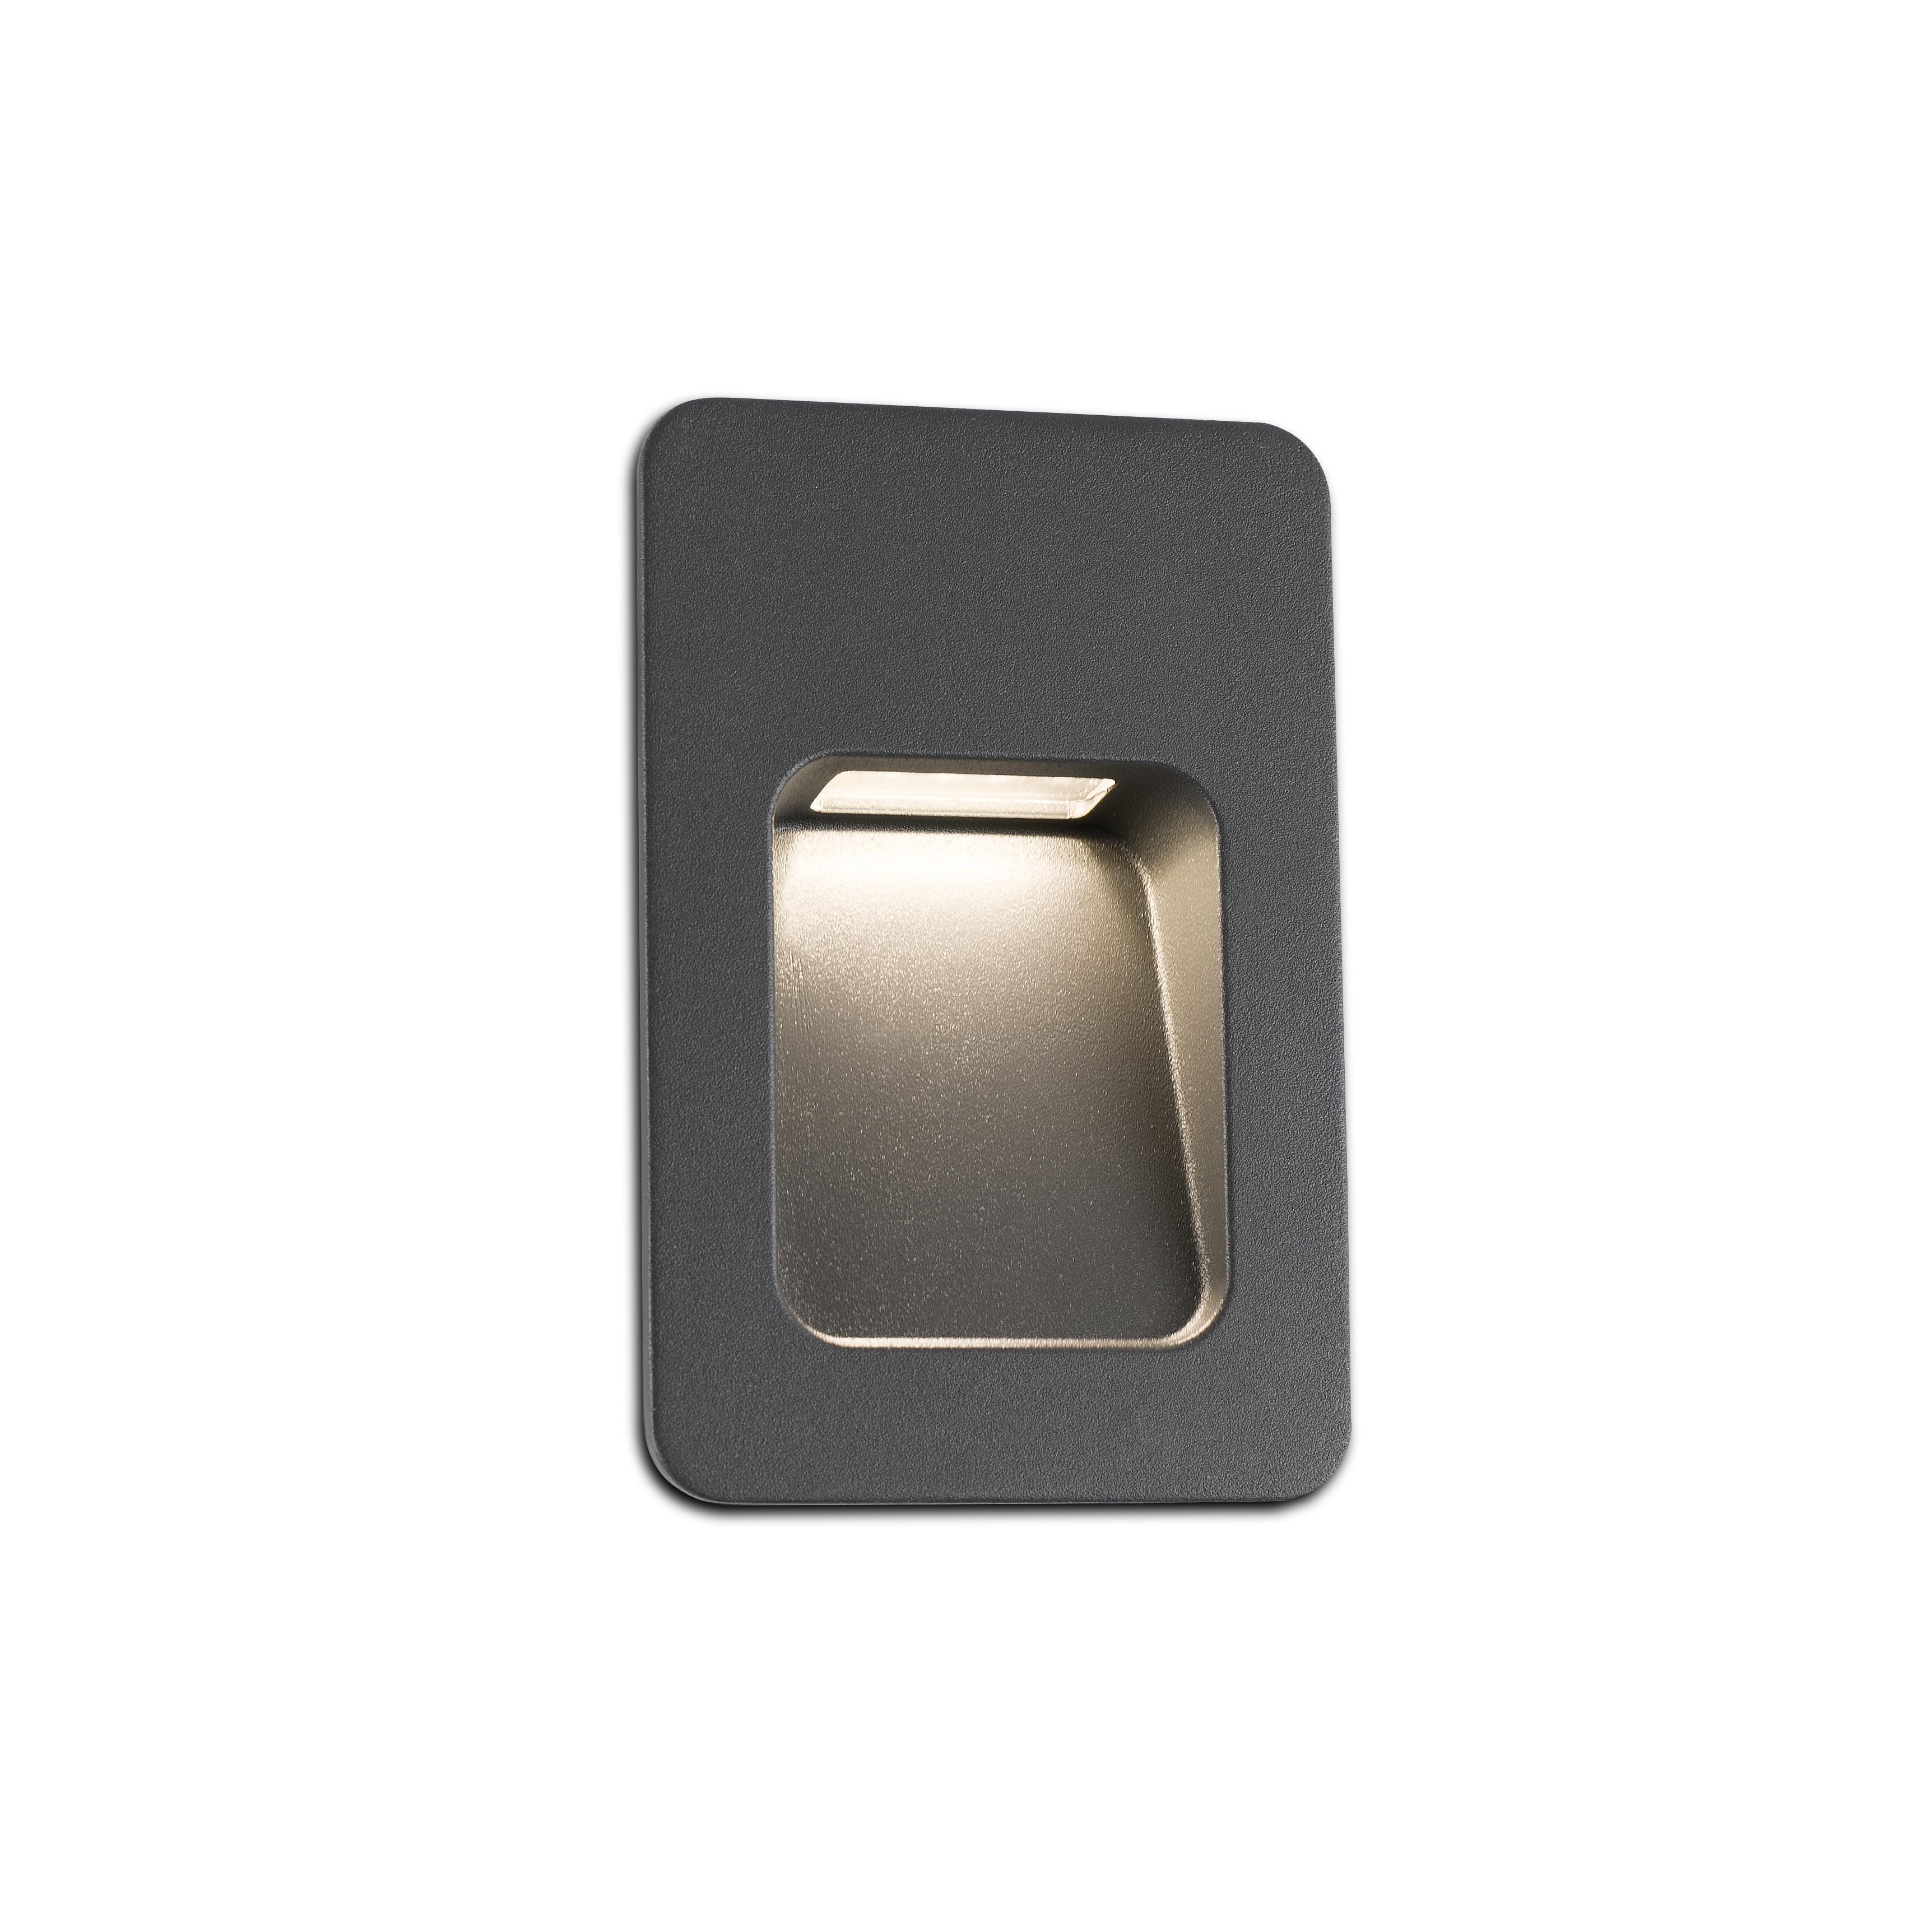 Nase 2 Empotrable Exterior LED 3W 3000K Gris Oscuro